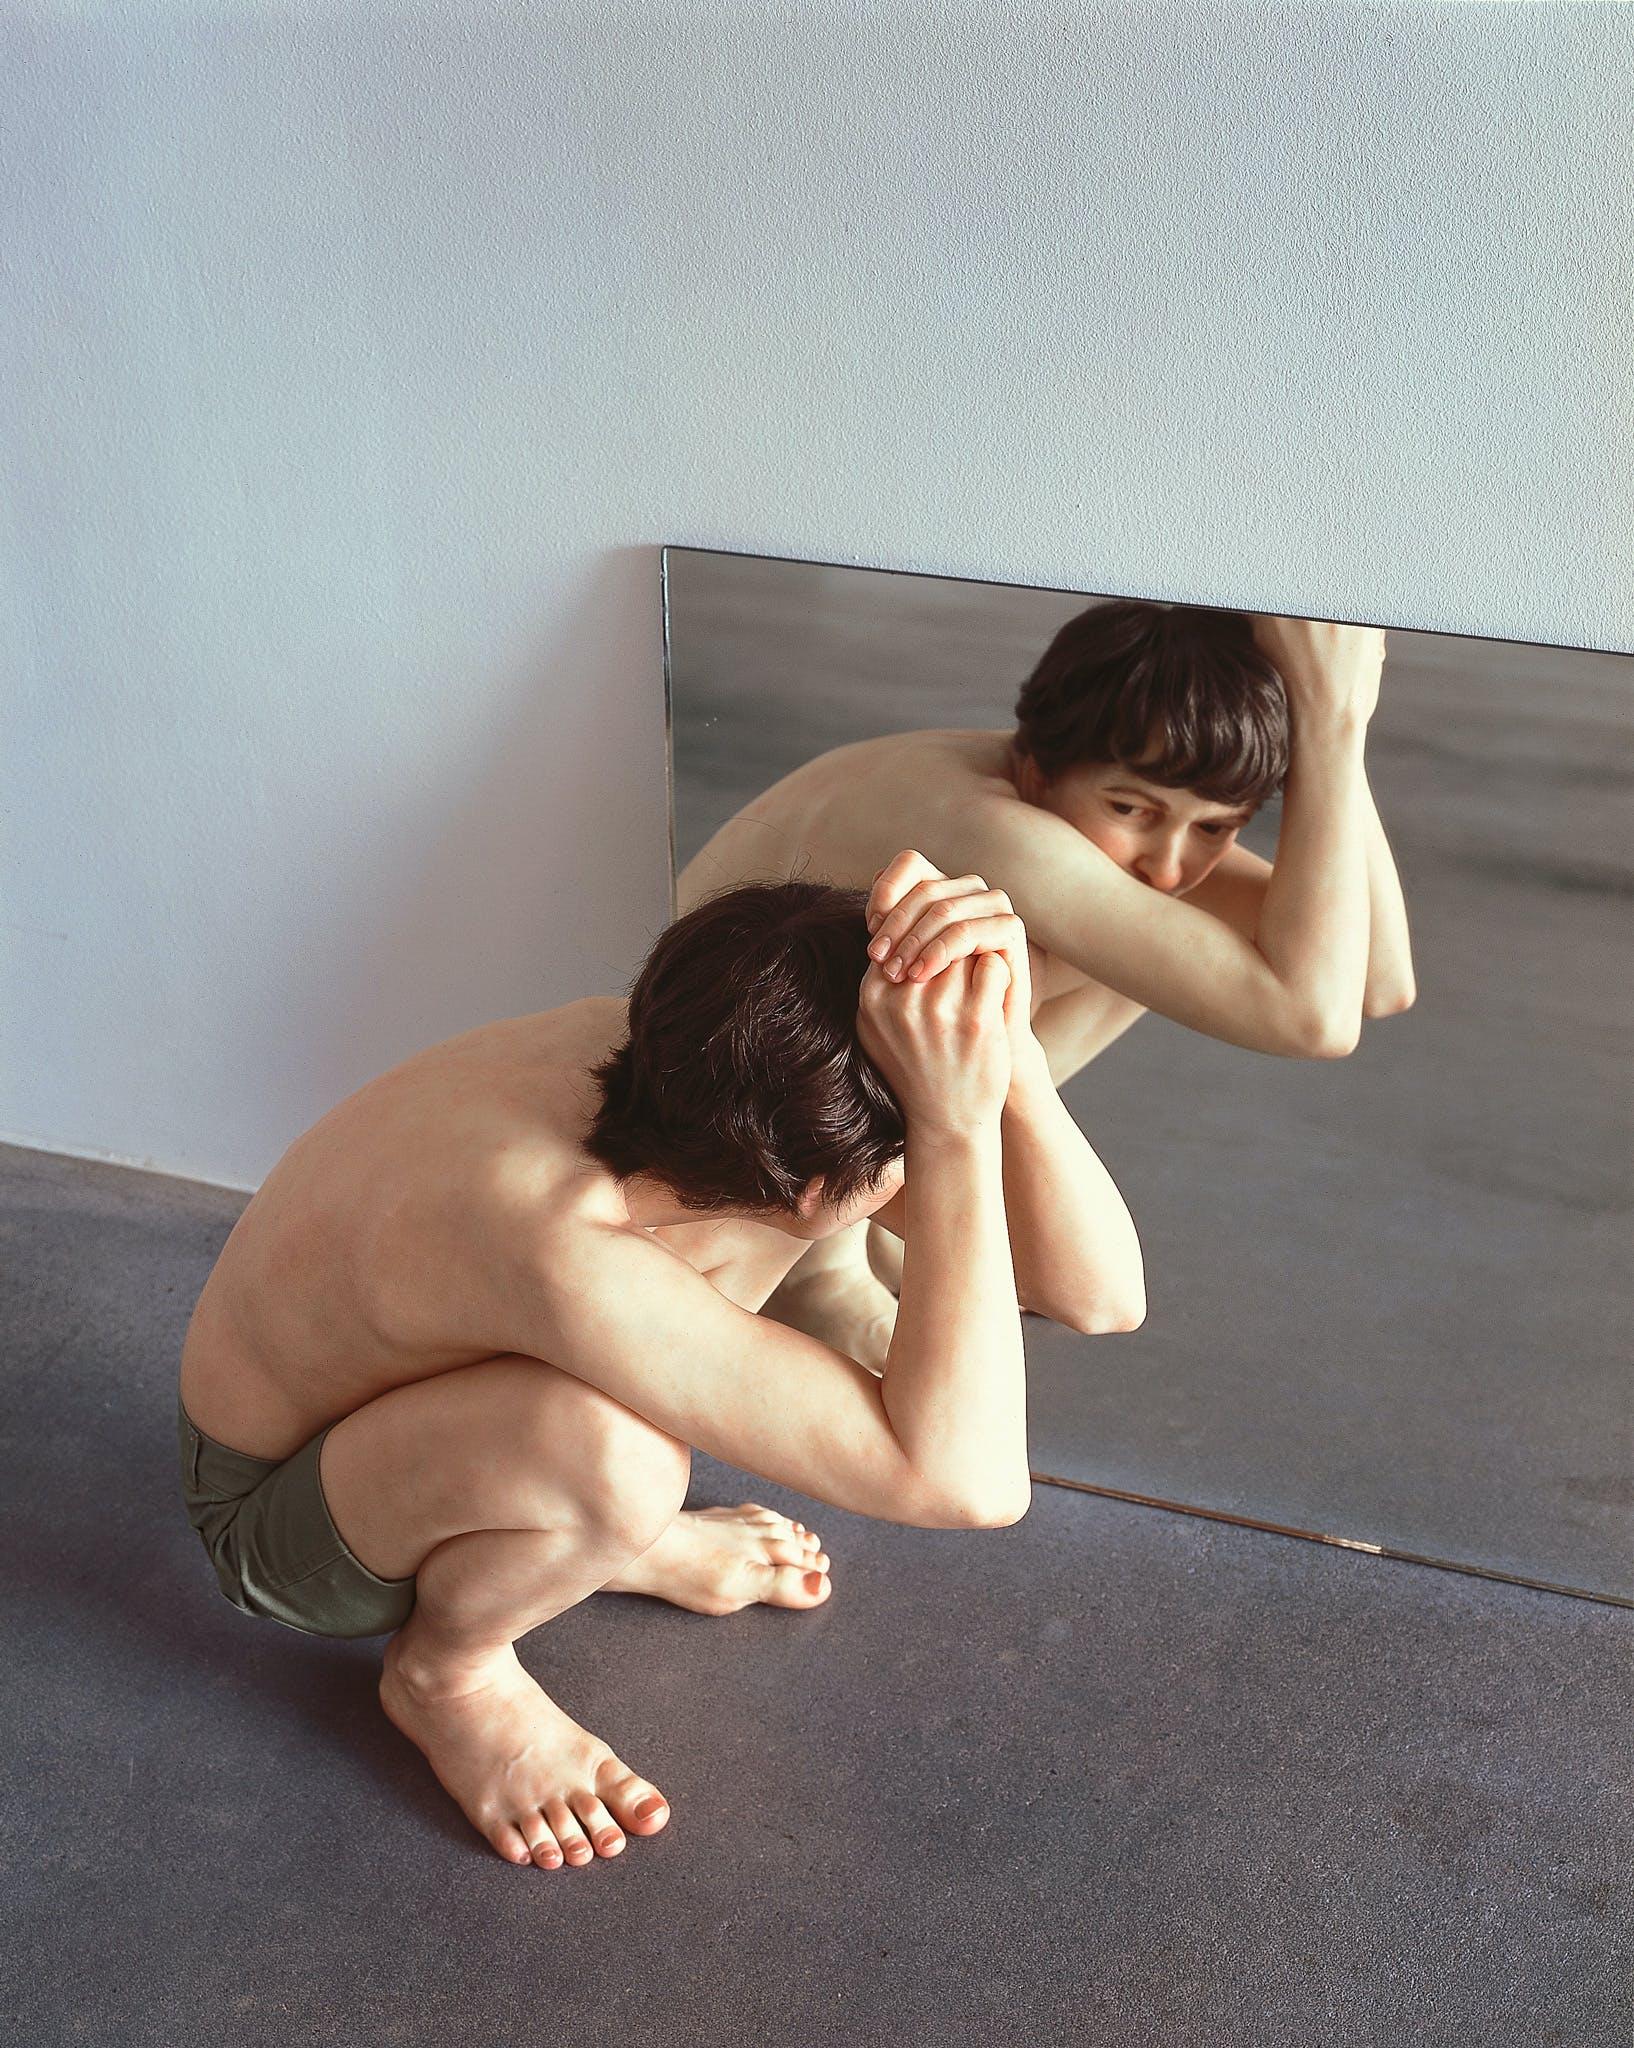 Ron Mueck, Crouching Boy in Mirror, 1999-2000